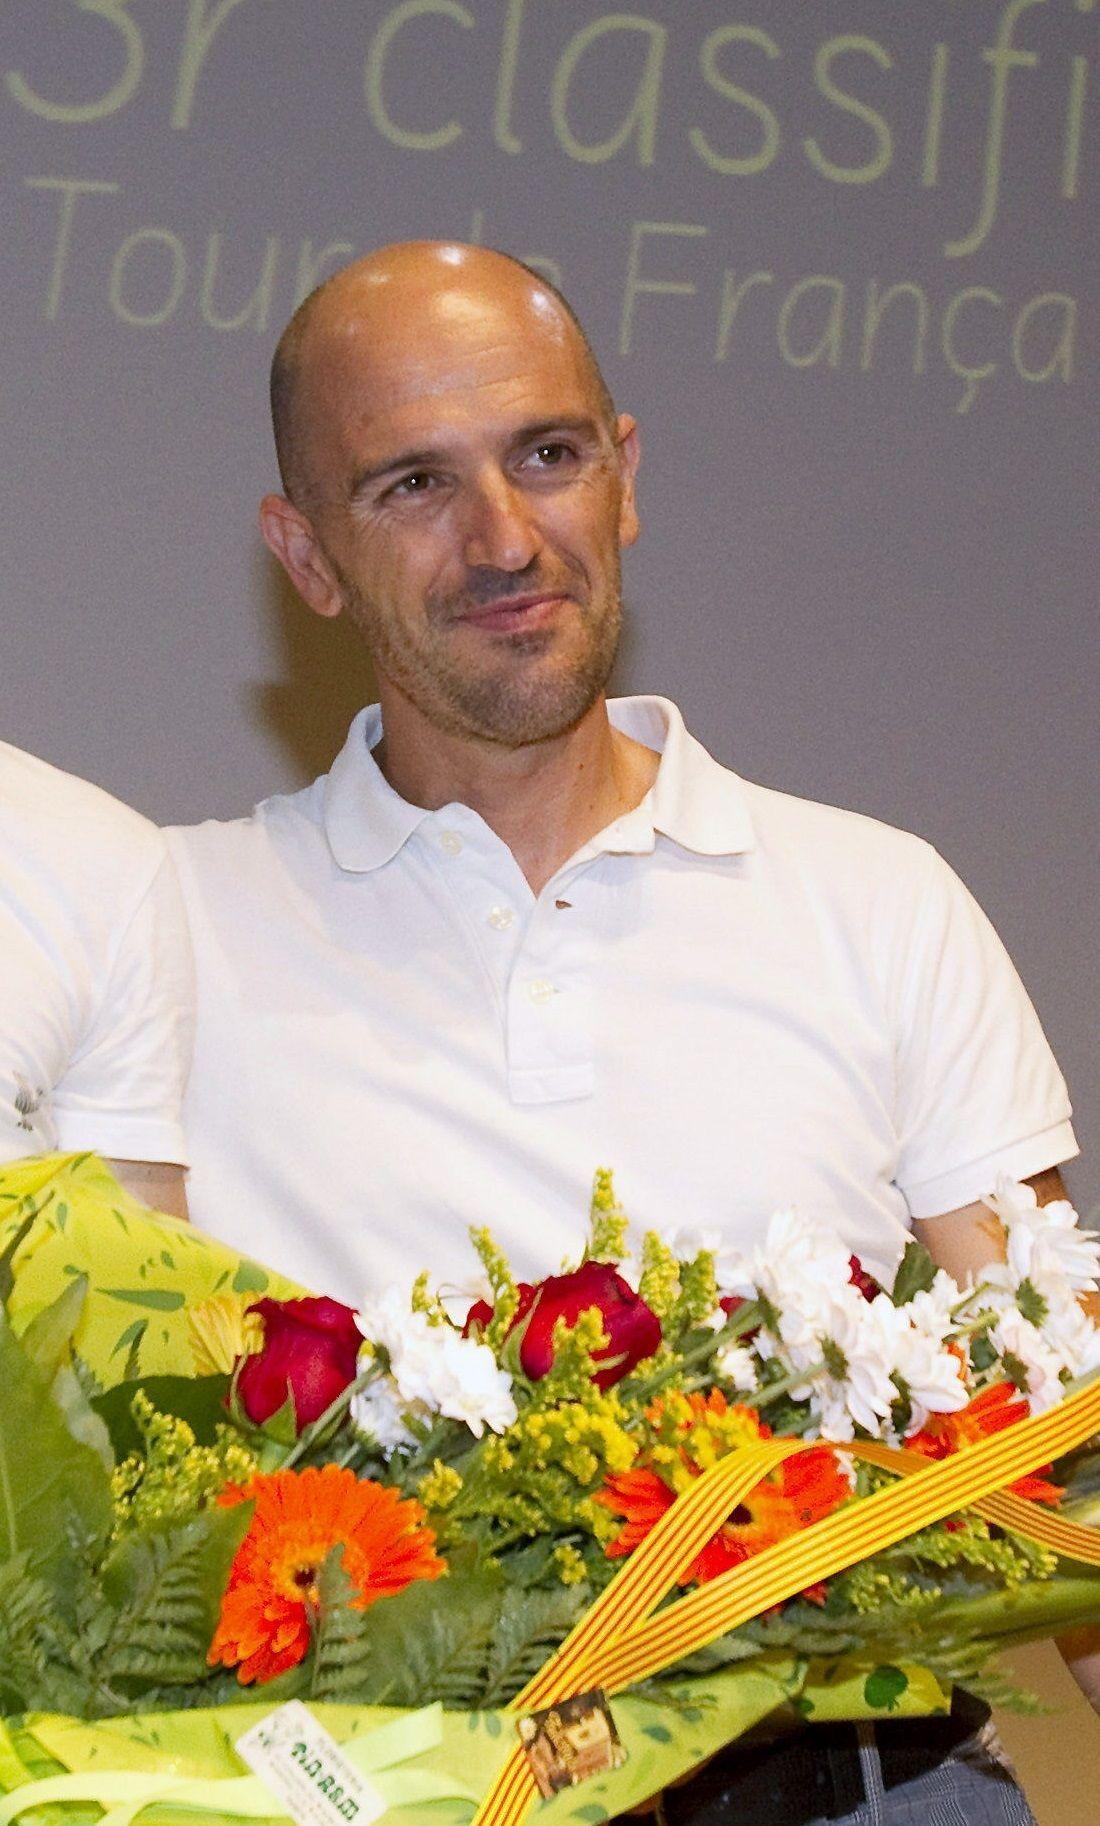 Spanish mountaineer Sergi Mingote dies after accident, Parets Del Valles, Spain - 16 Jan 2021